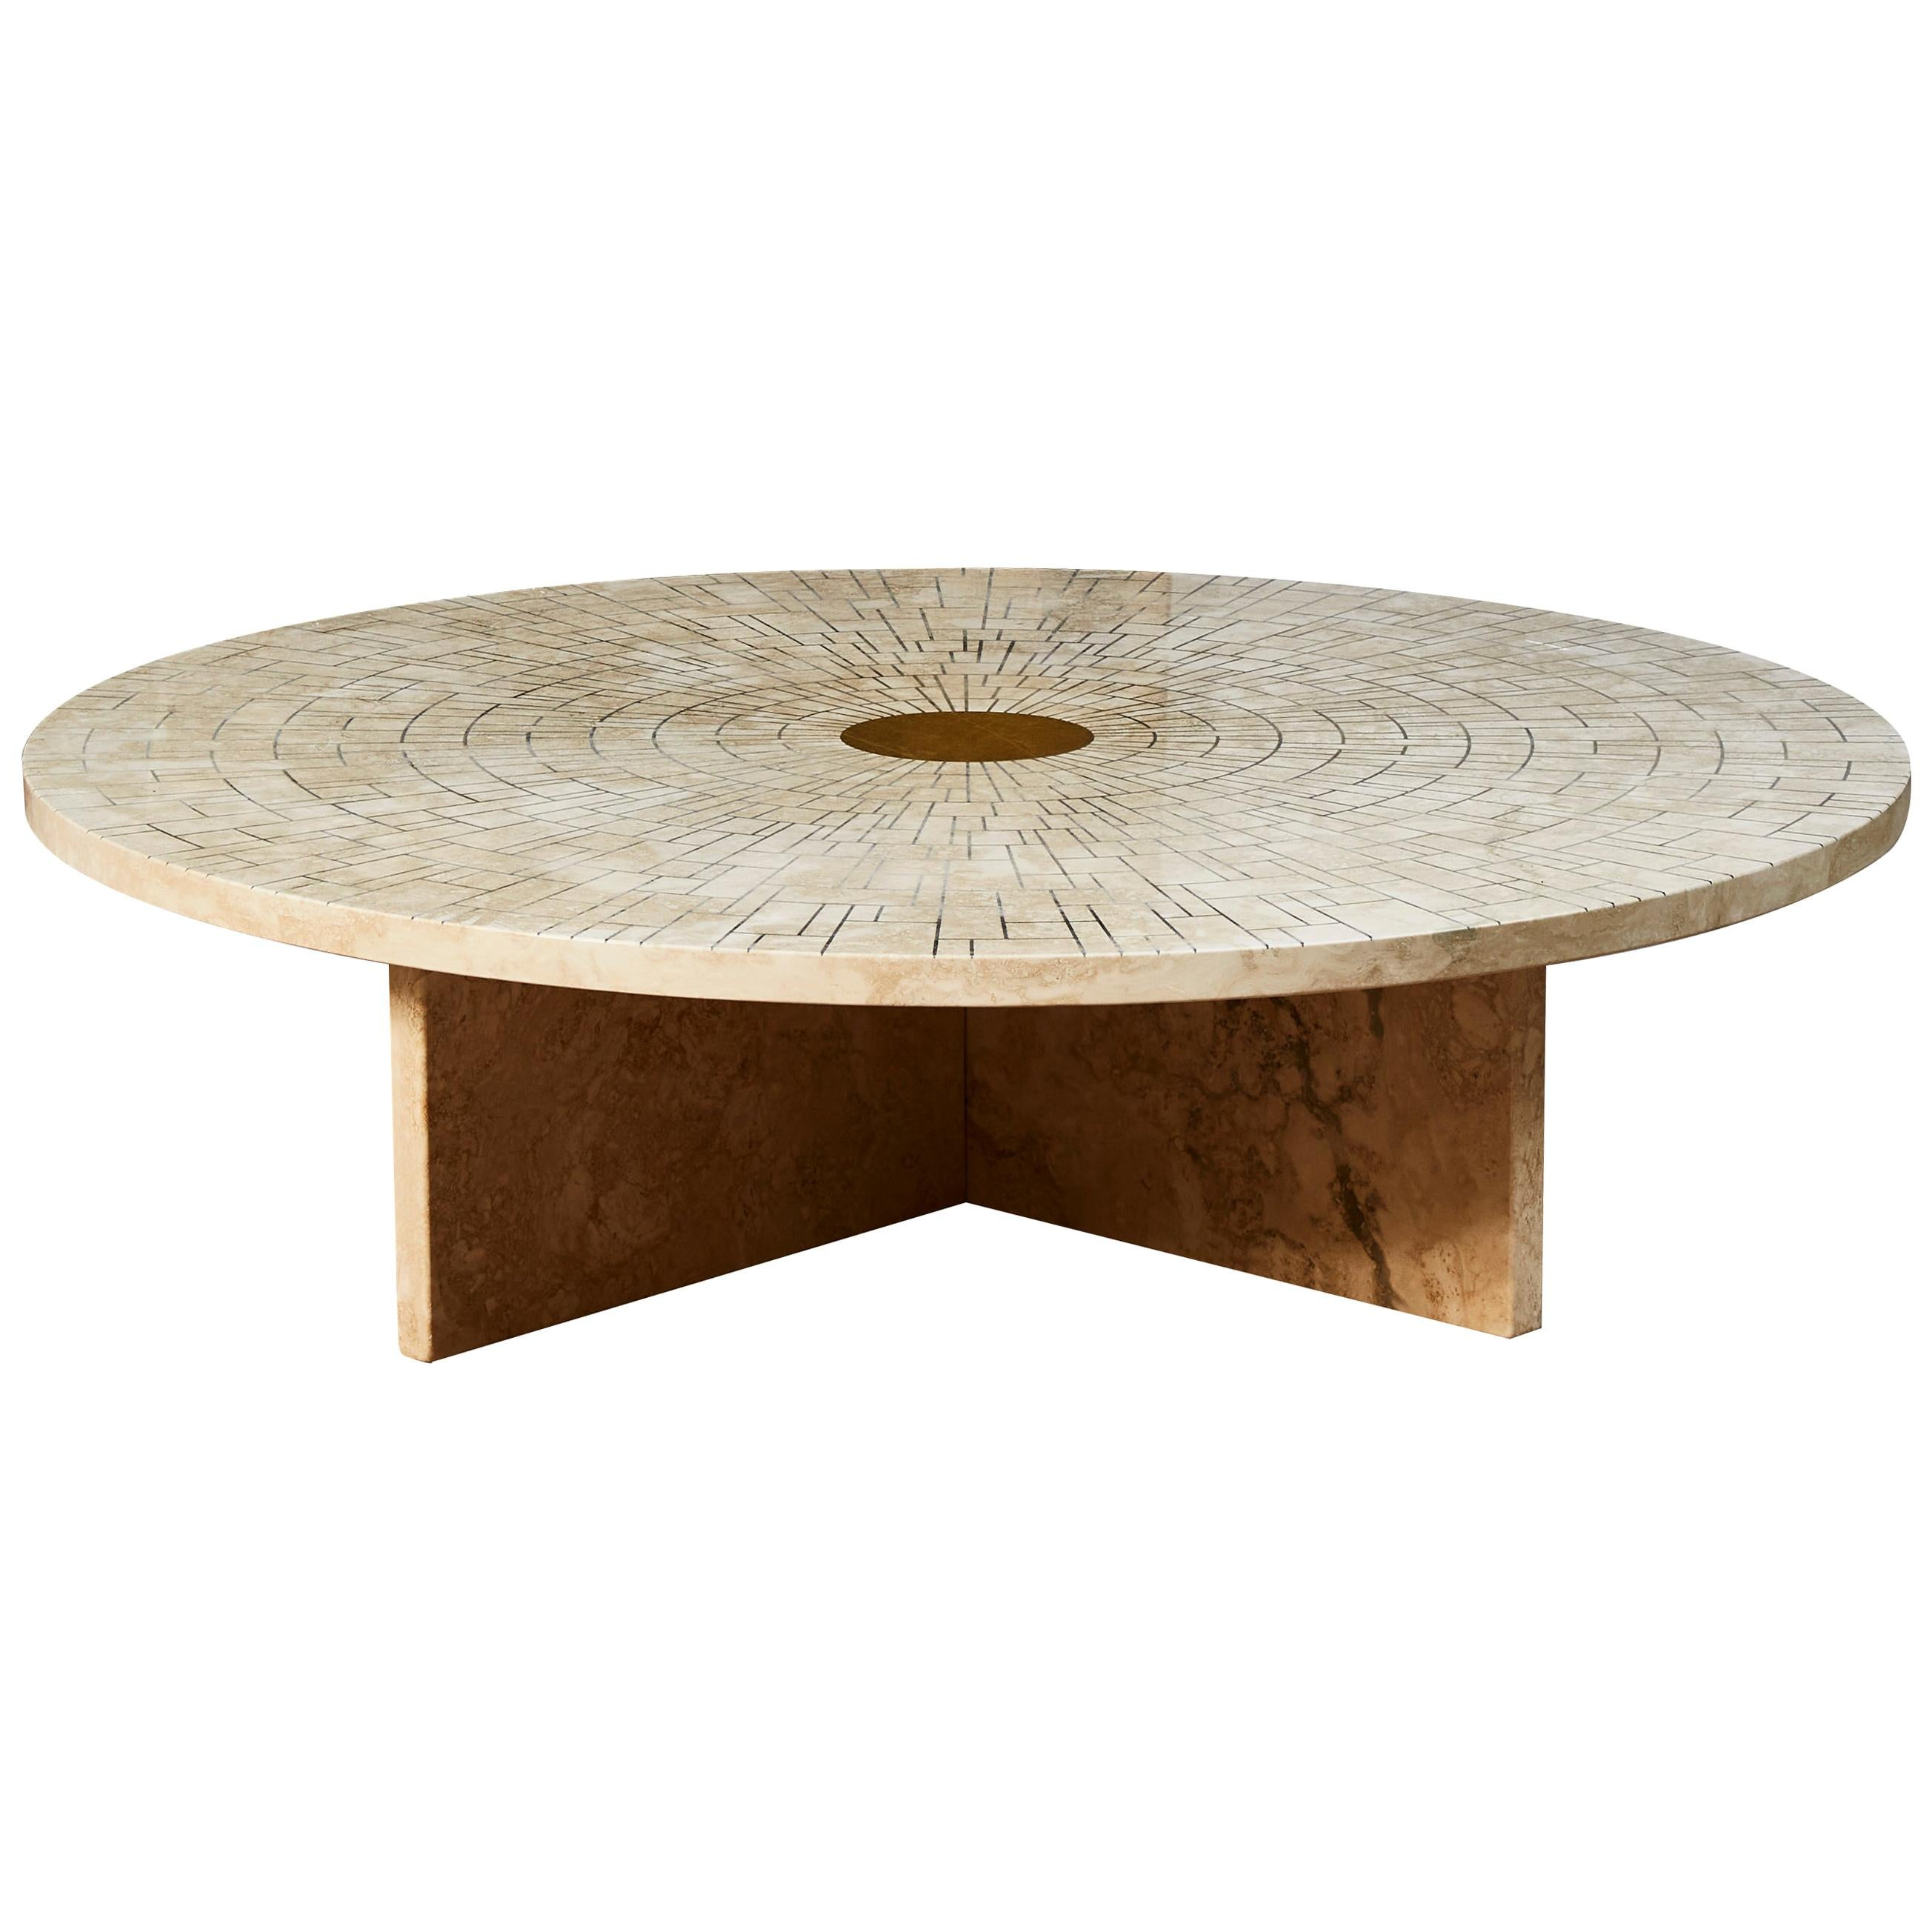 Travertine Coffee Table by Studio Glustin